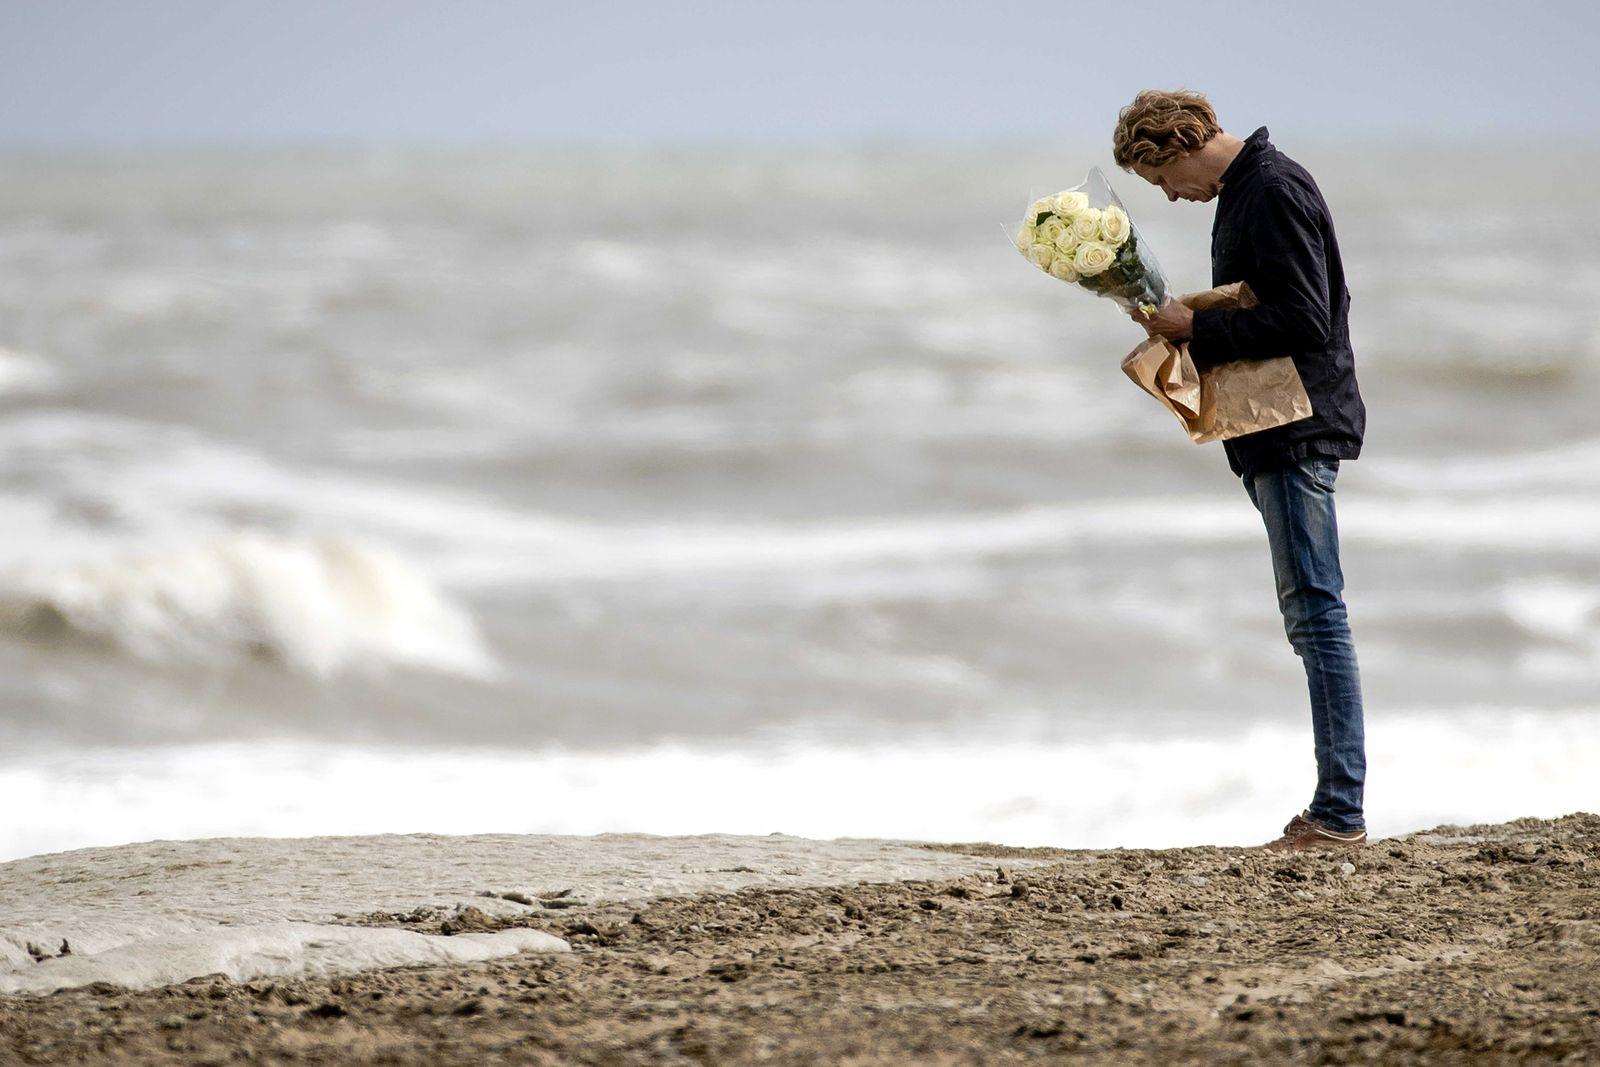 Scheveningen is mourning, Netherlands - 12 May 2020